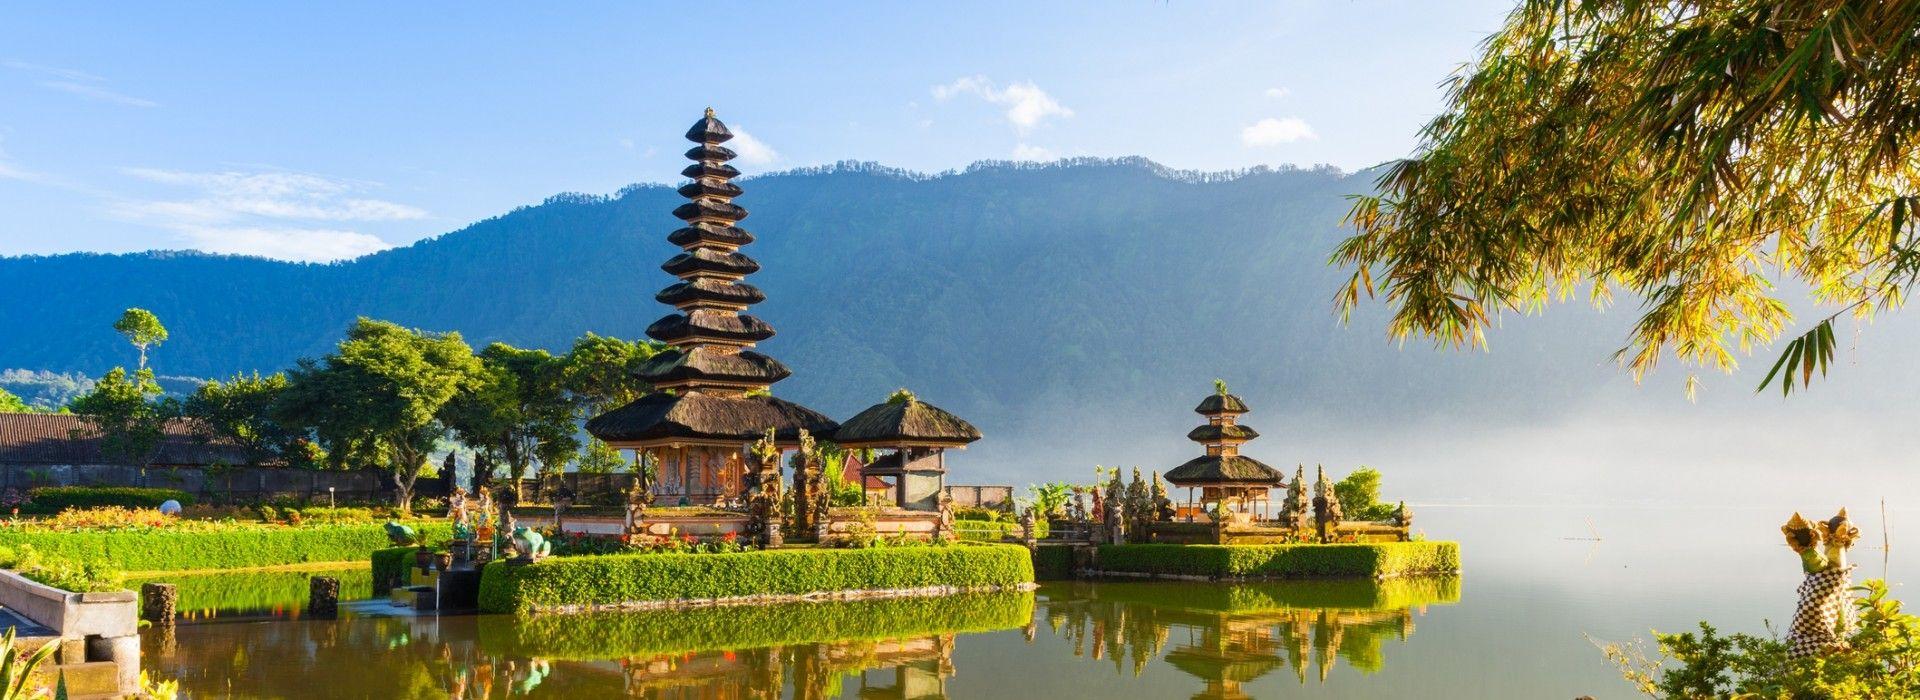 Trekking Tours in Indonesia